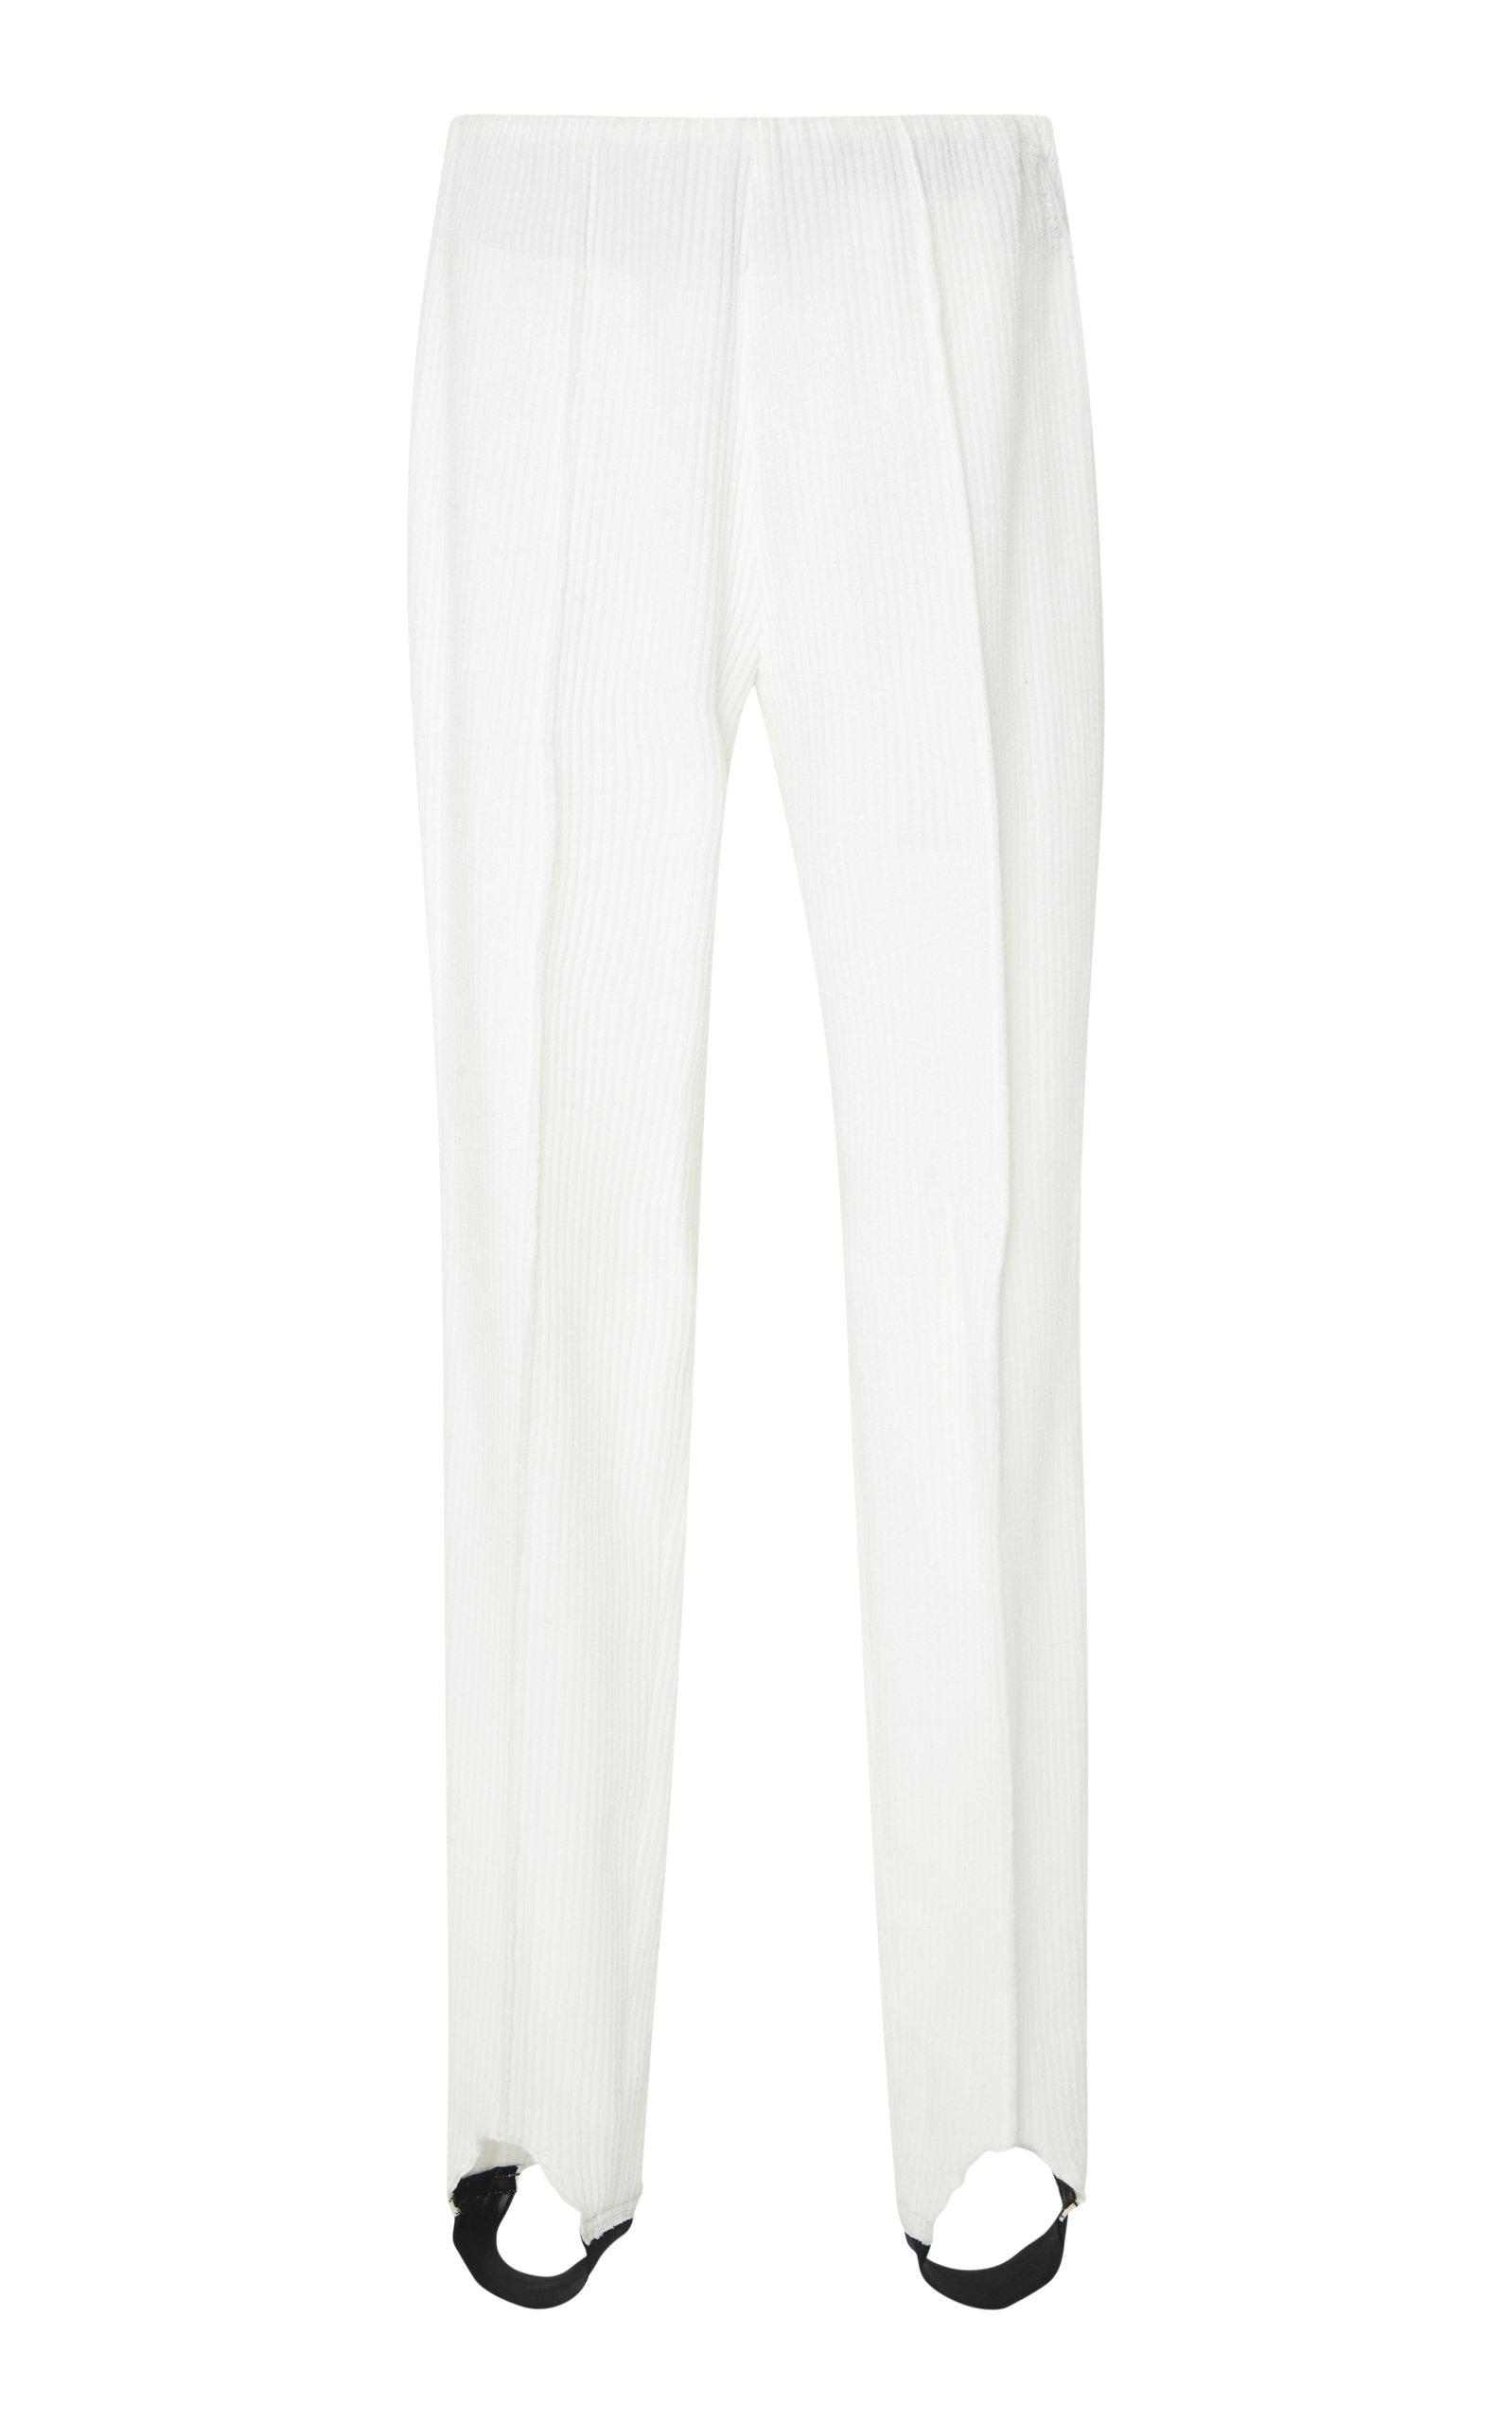 e5c5b3f18 Elaine Corduroy Ski Pants in White